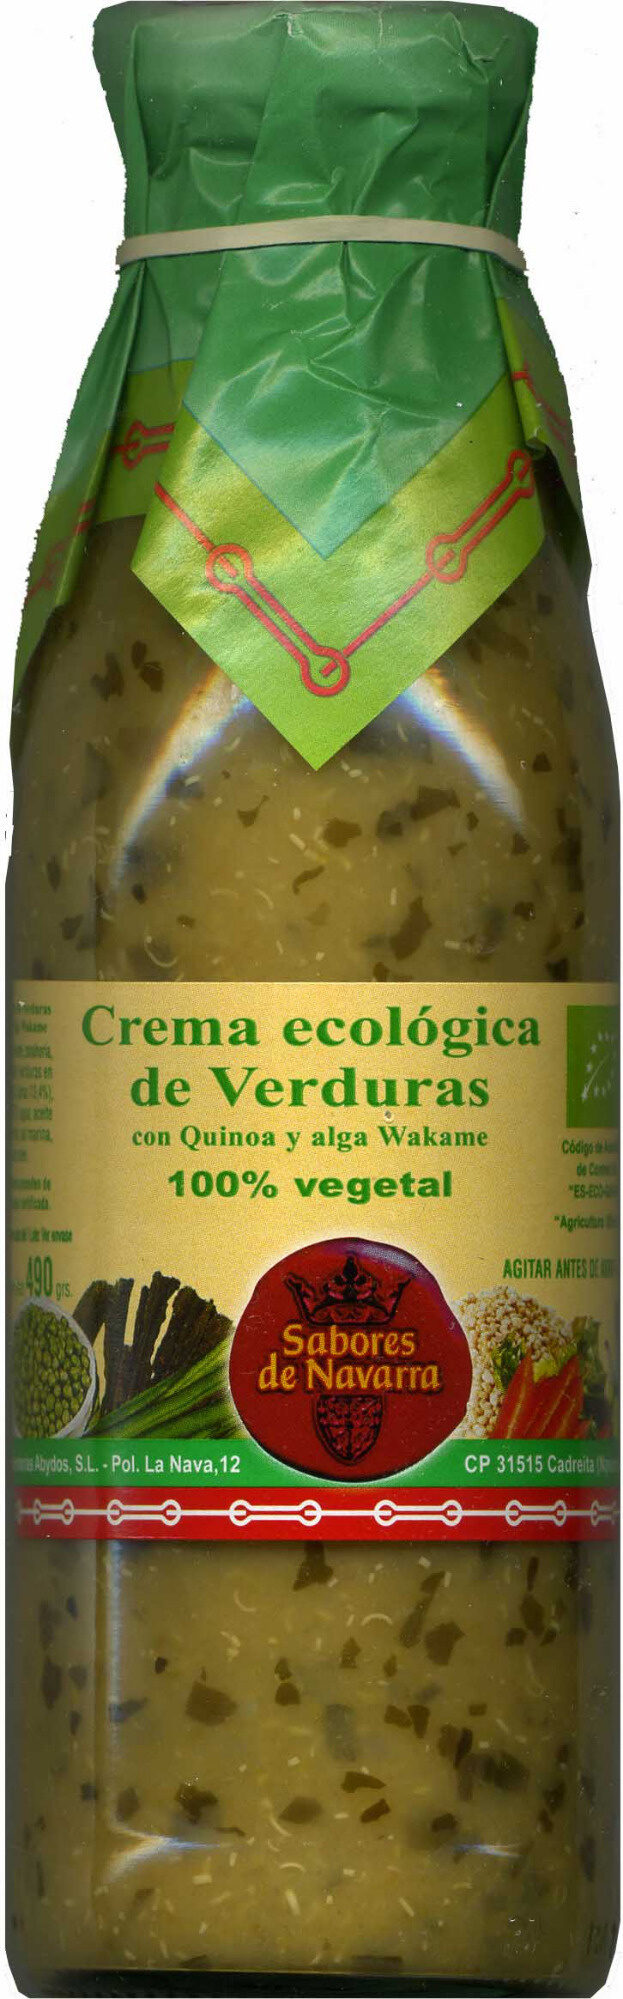 Crema ecológica de verduras (descatalogado) - Produit - es